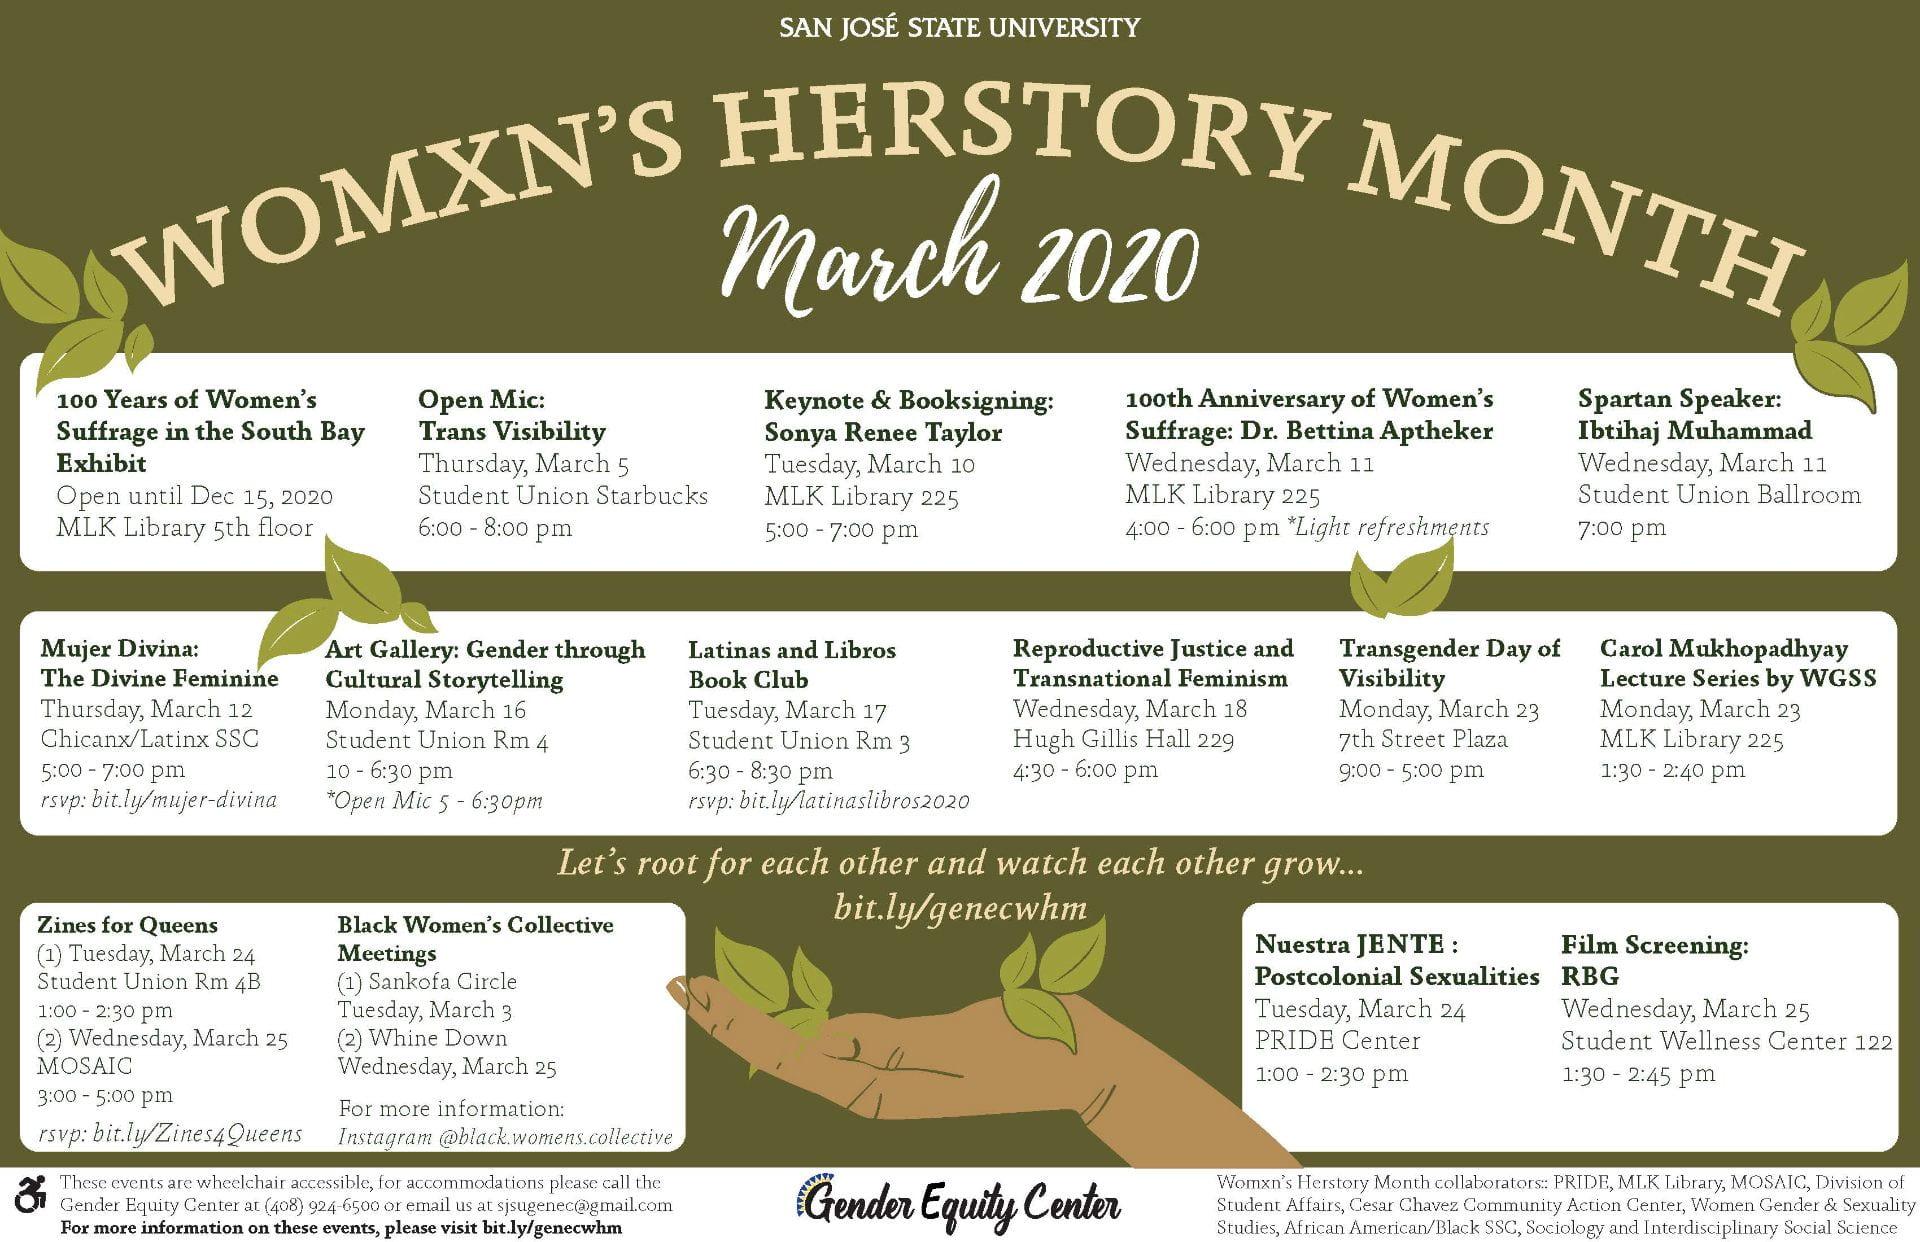 Womxn's Herstory Calendar 2020